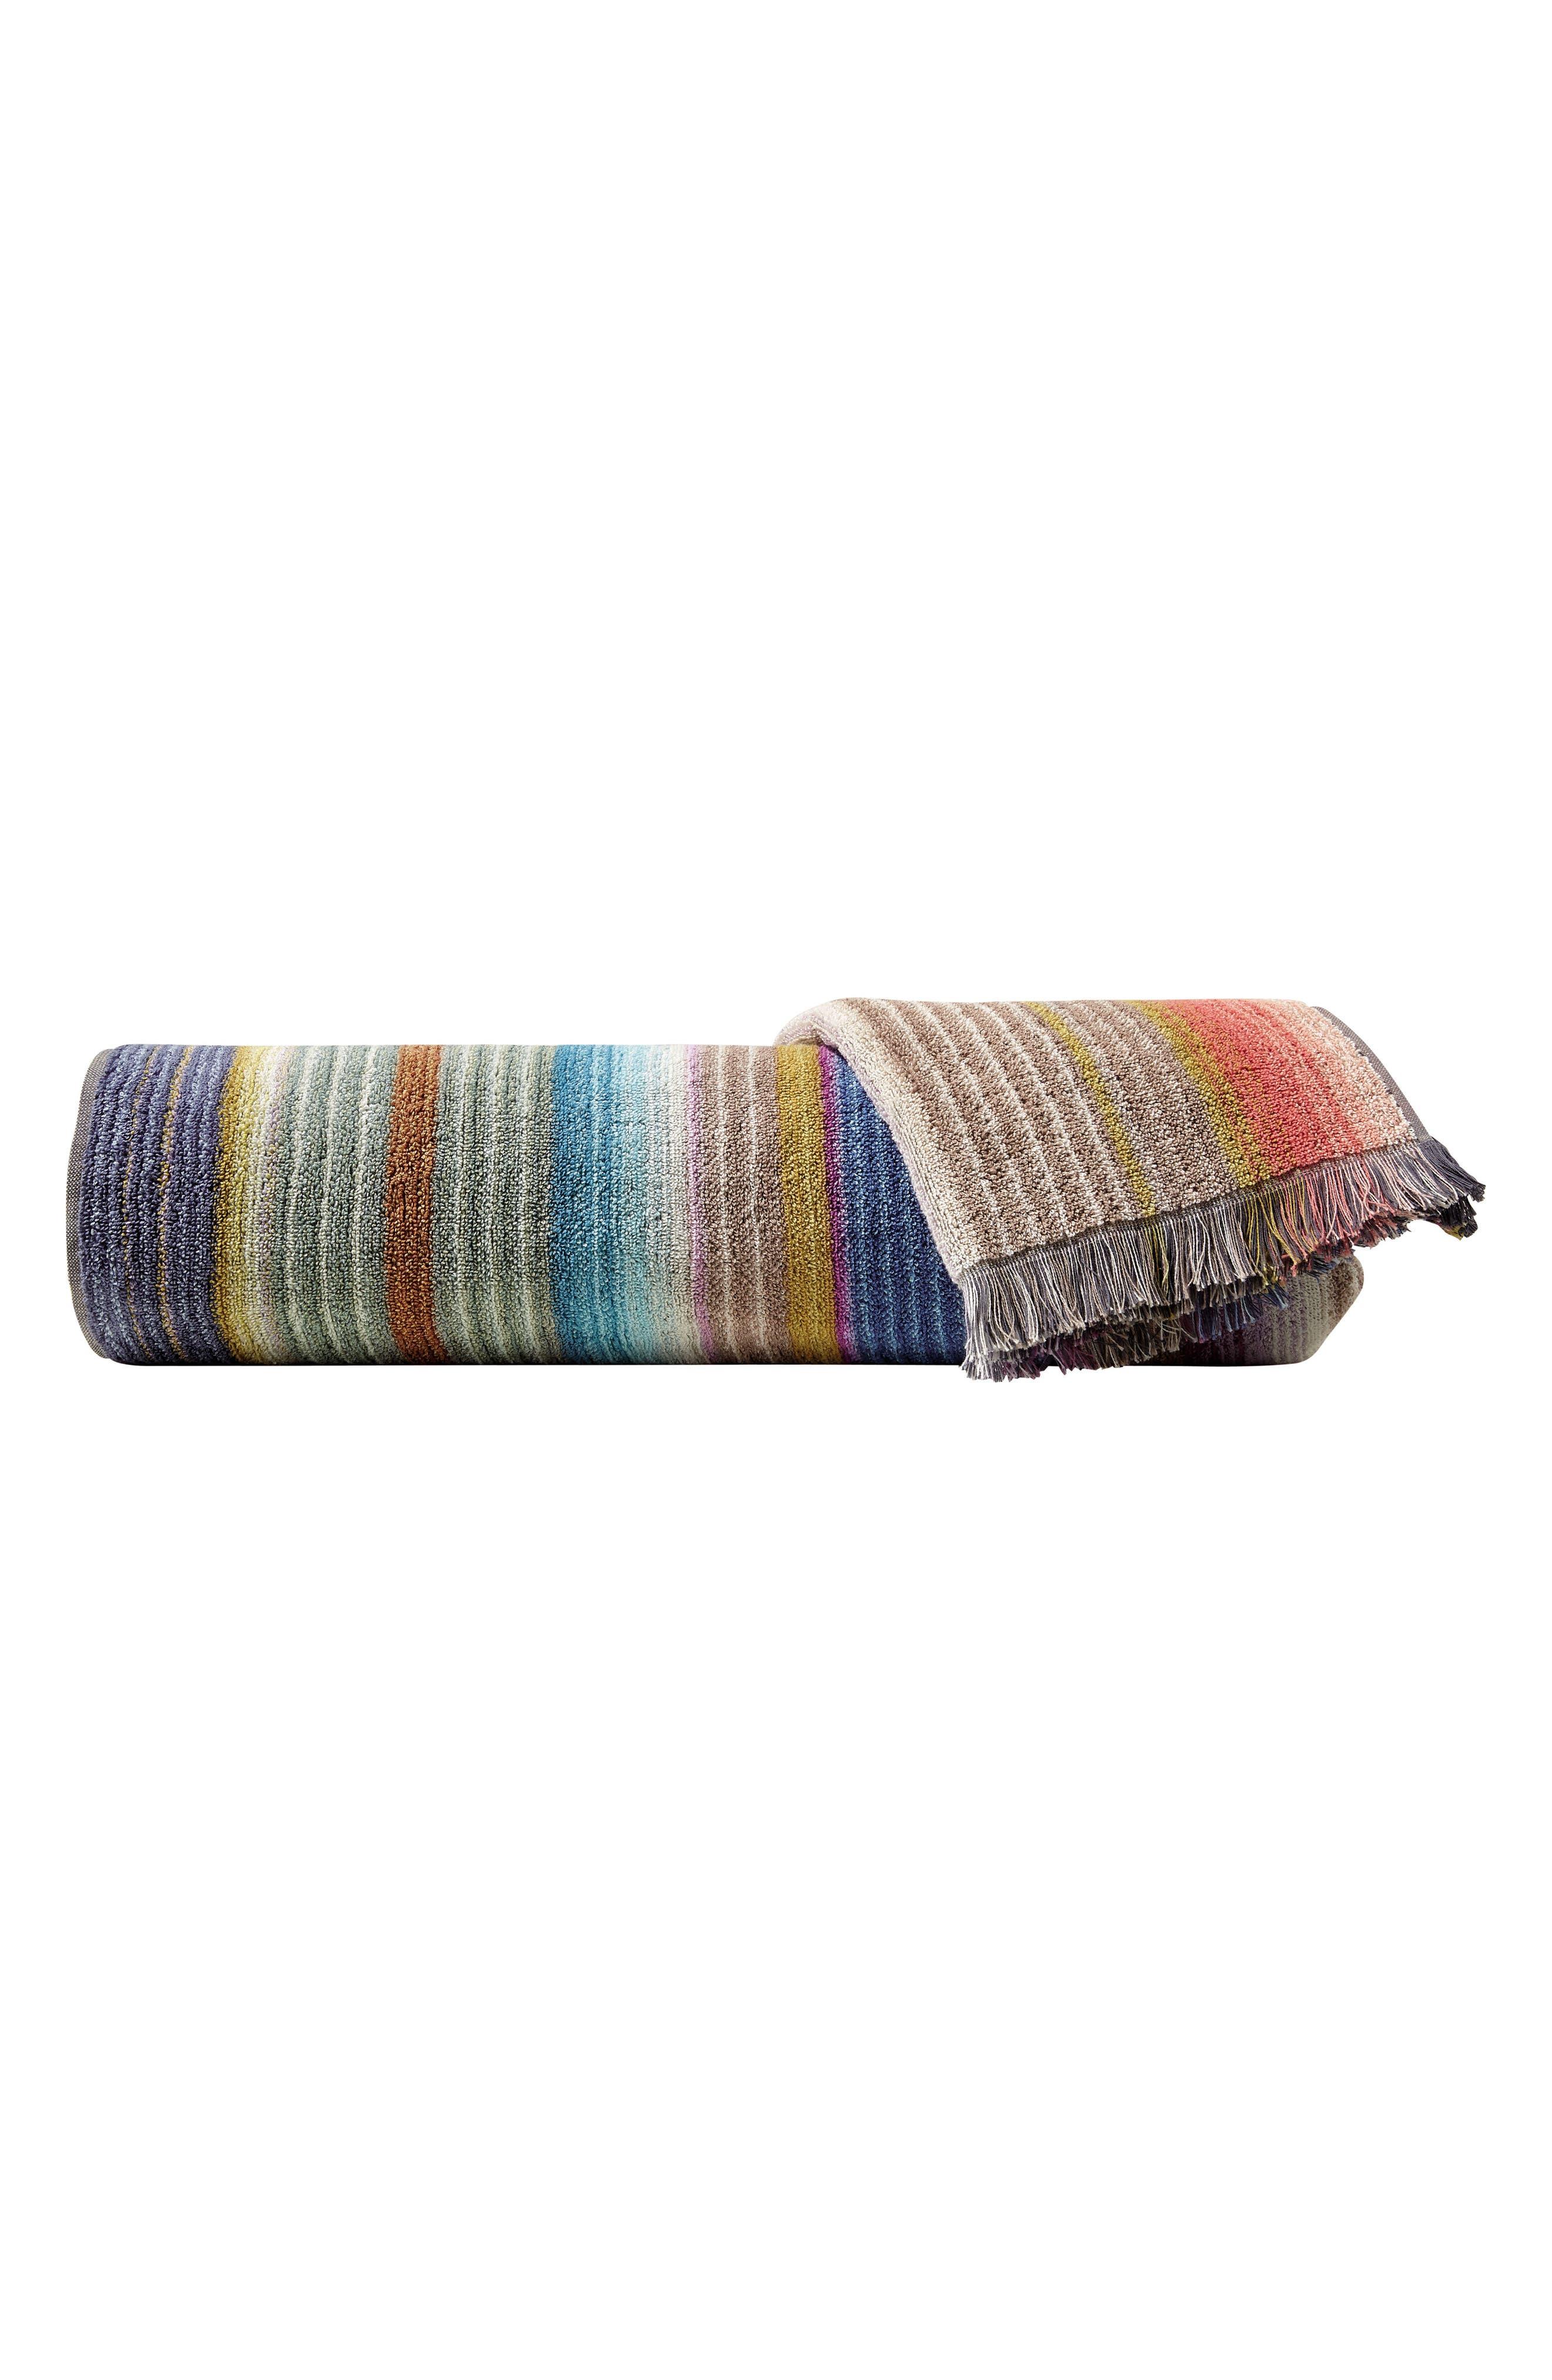 Main Image - MissoniHome Viviette Bath Towel